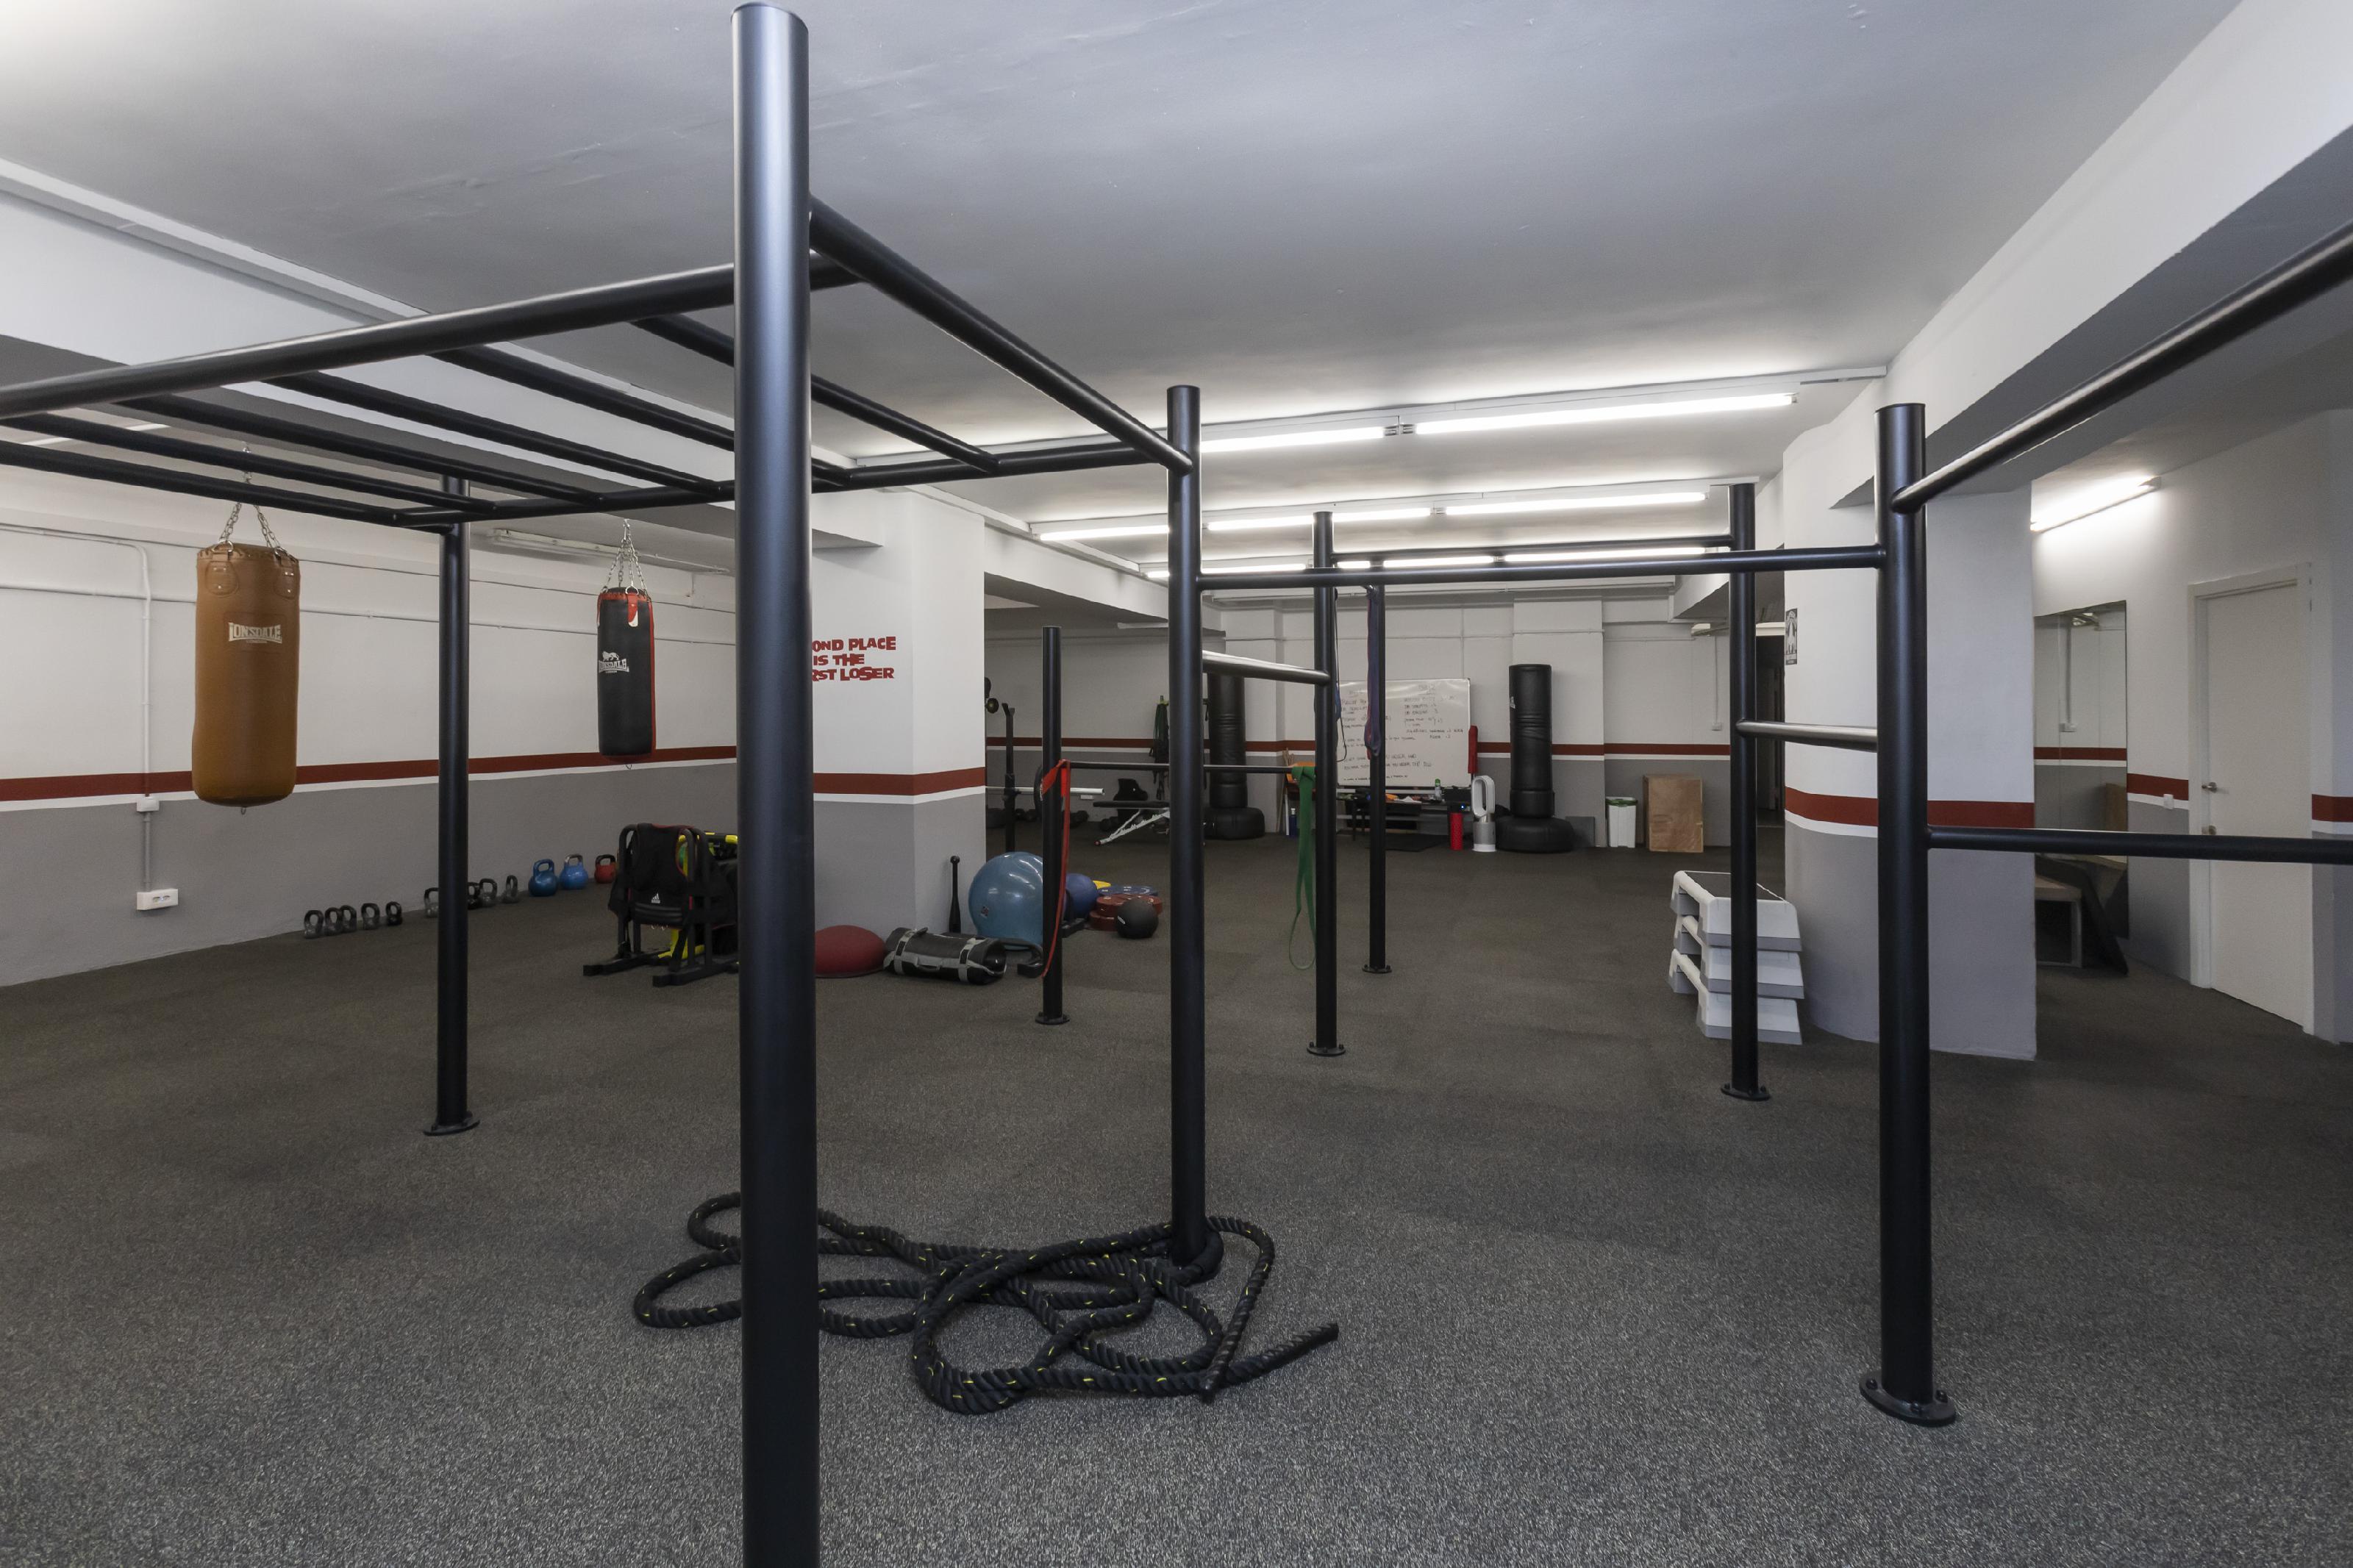 249493 Commercial premises for sale in Sarrià-Sant Gervasi, Sant Gervasi-Galvany 9